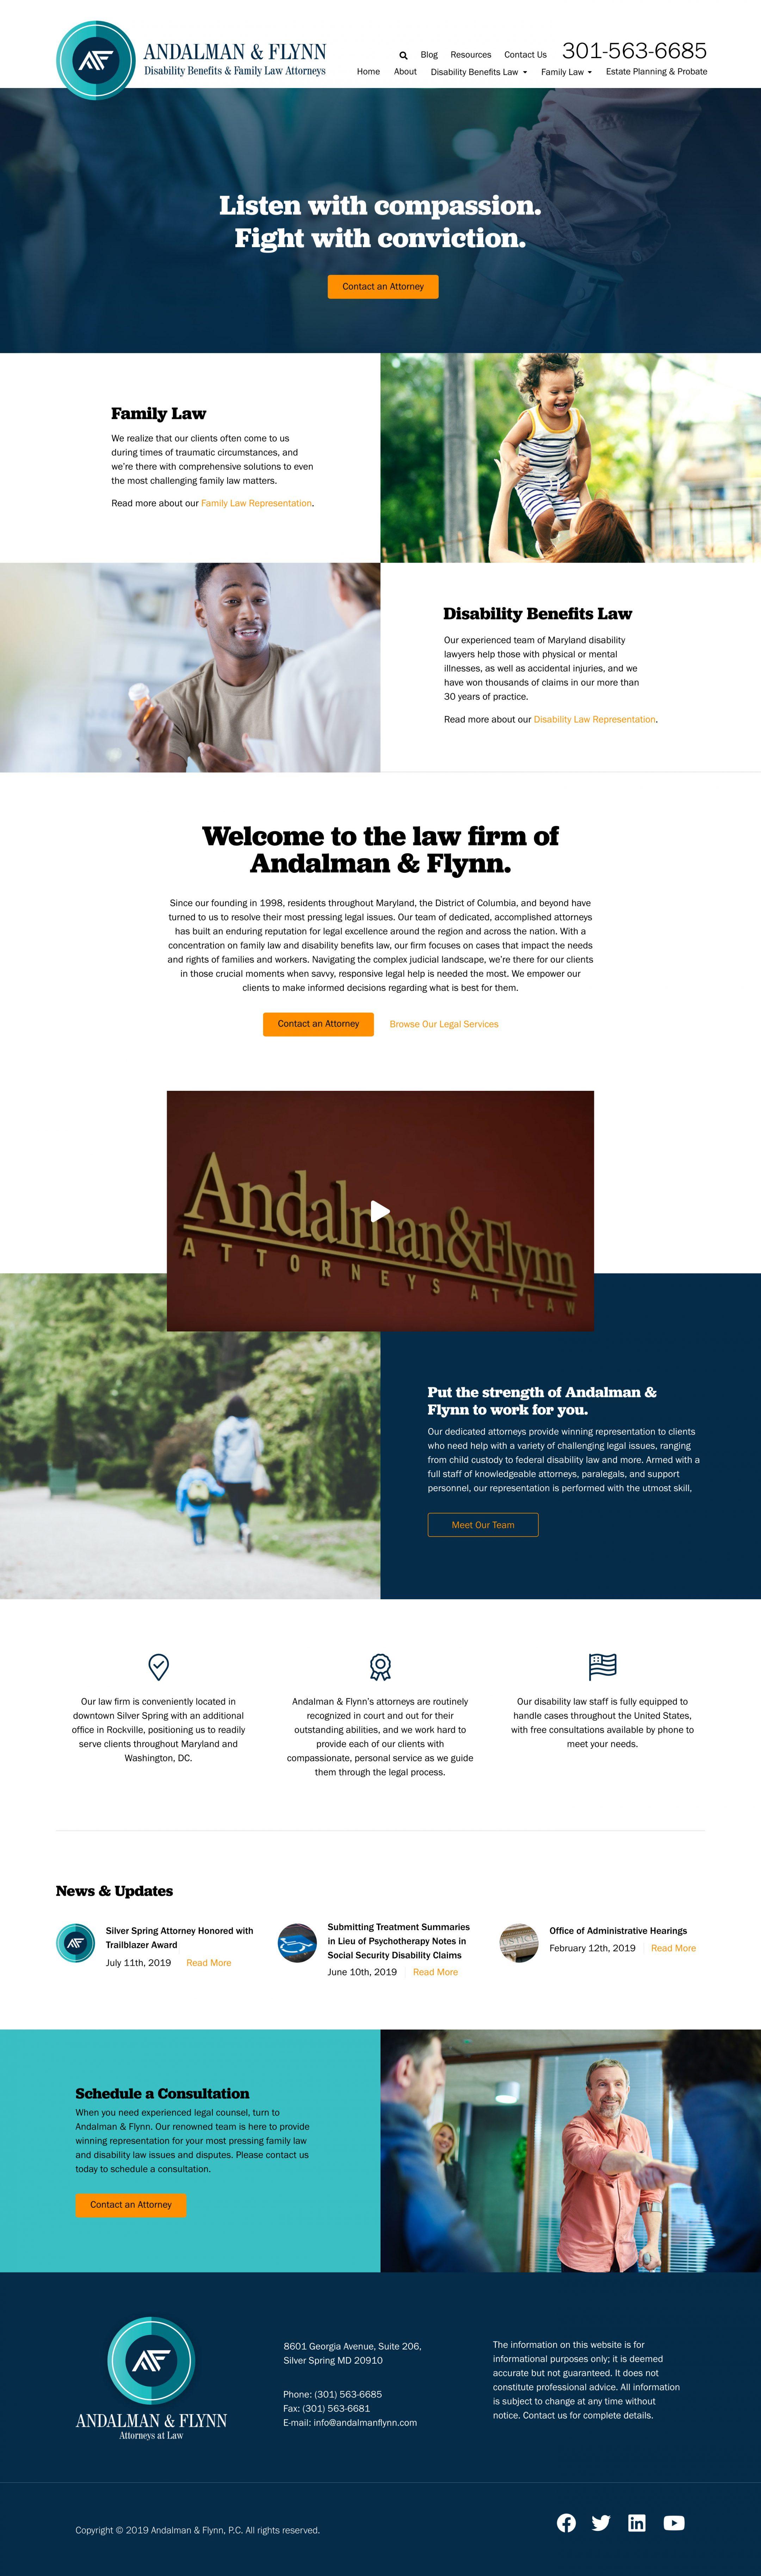 andalmanflynn.com home page